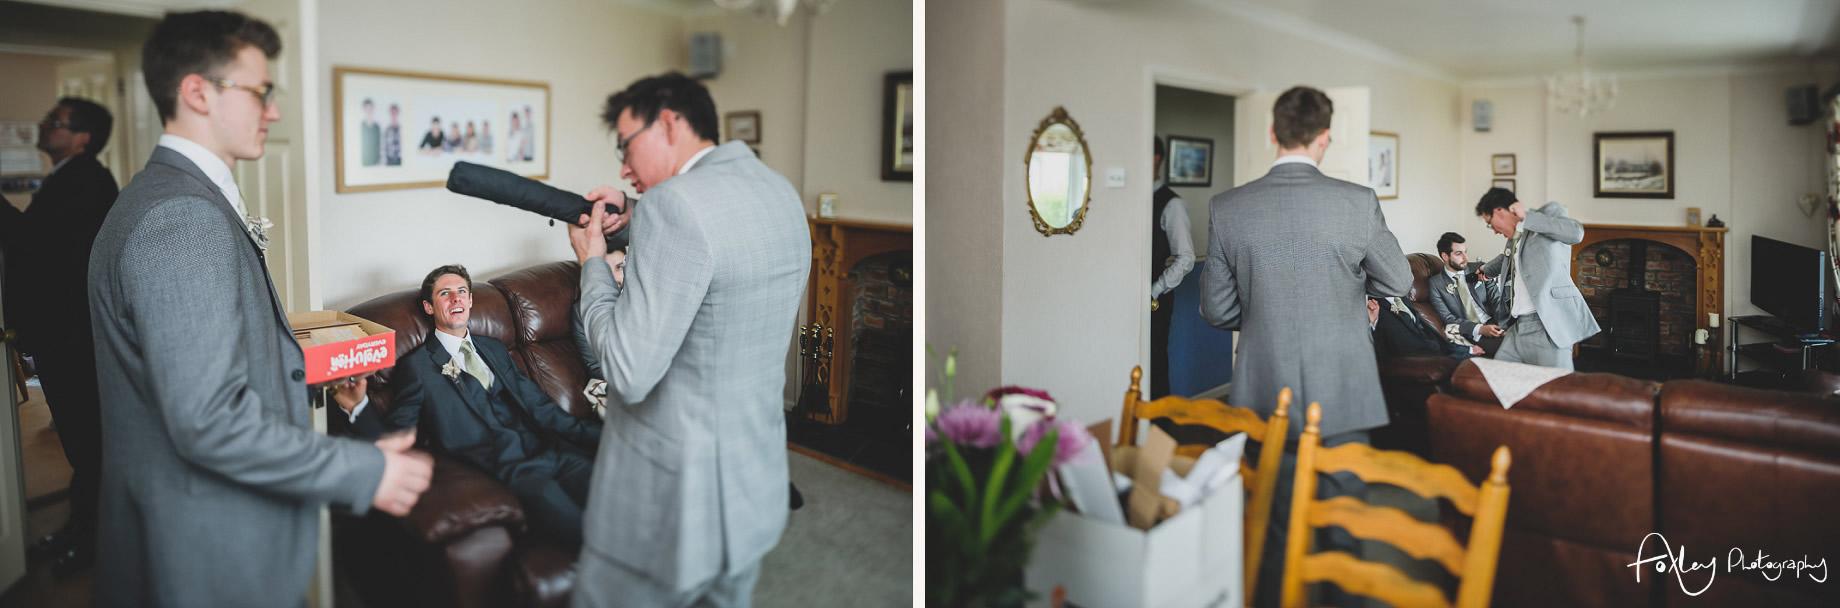 Mel-and-Lewis-Wedding-at-Barley-Village-Hall-044